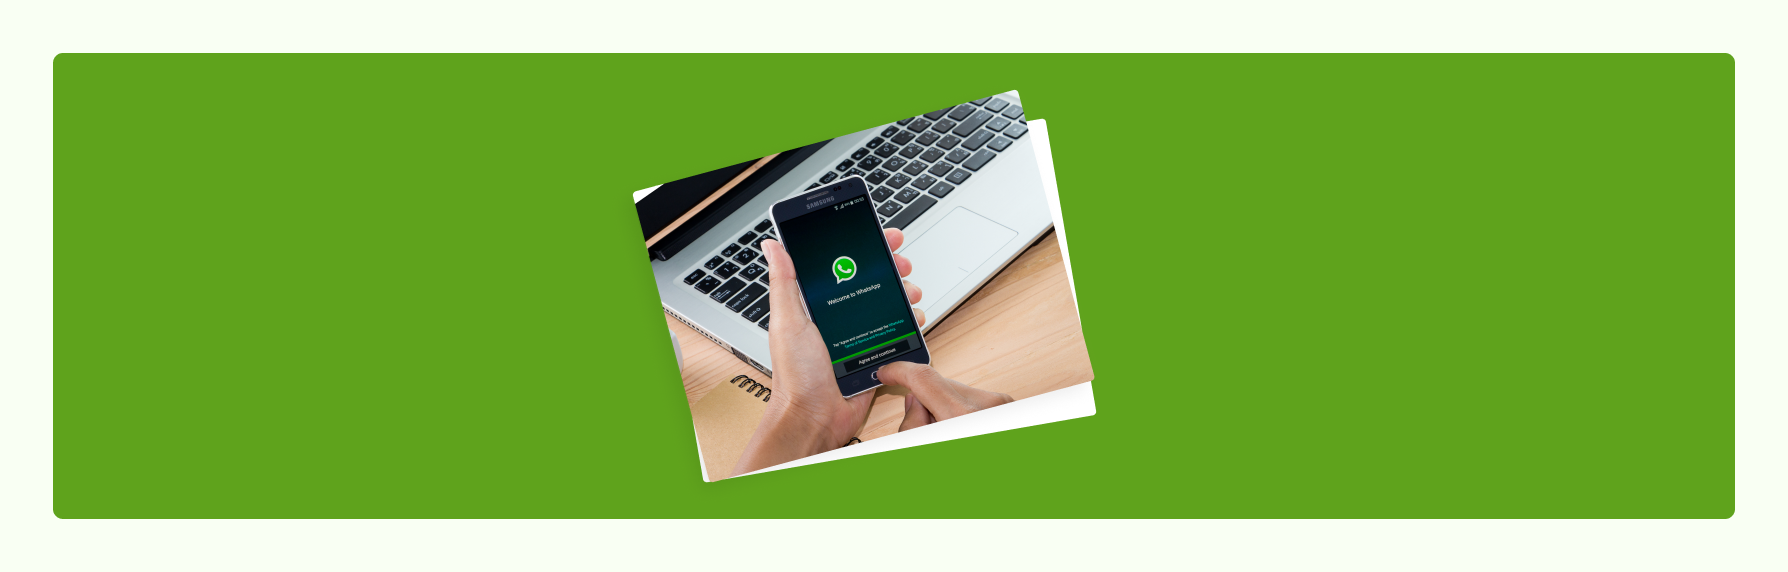 WhatsApp Business API: 5 Anbieter im Vergleich